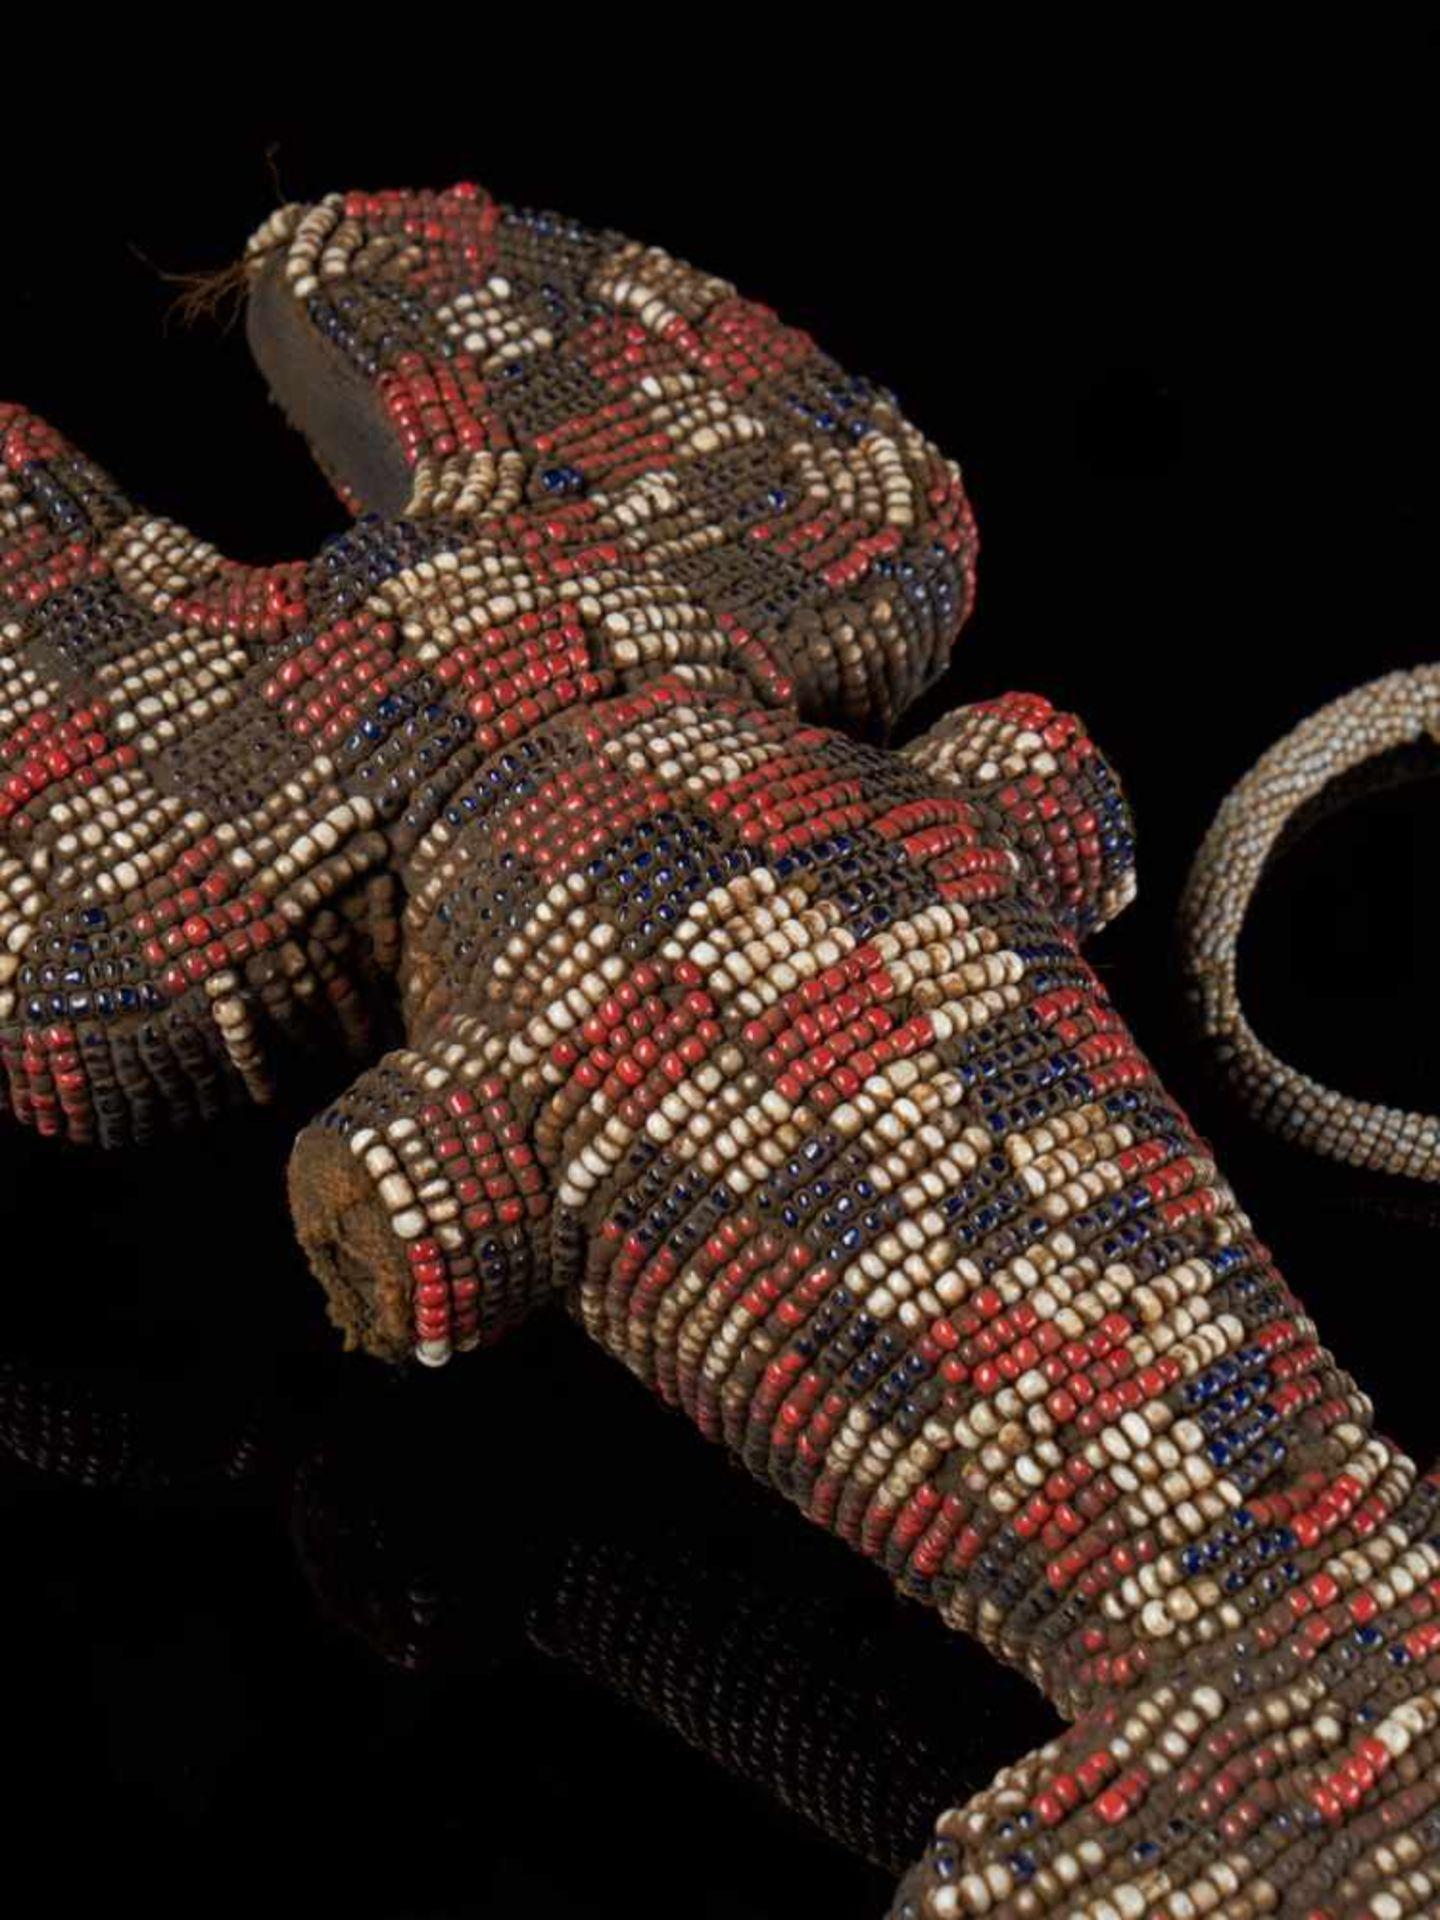 Beaded Ceremonial Flute - Tribal ArtThis intriguing beaded ceremonial flute is covered with a - Bild 2 aus 5